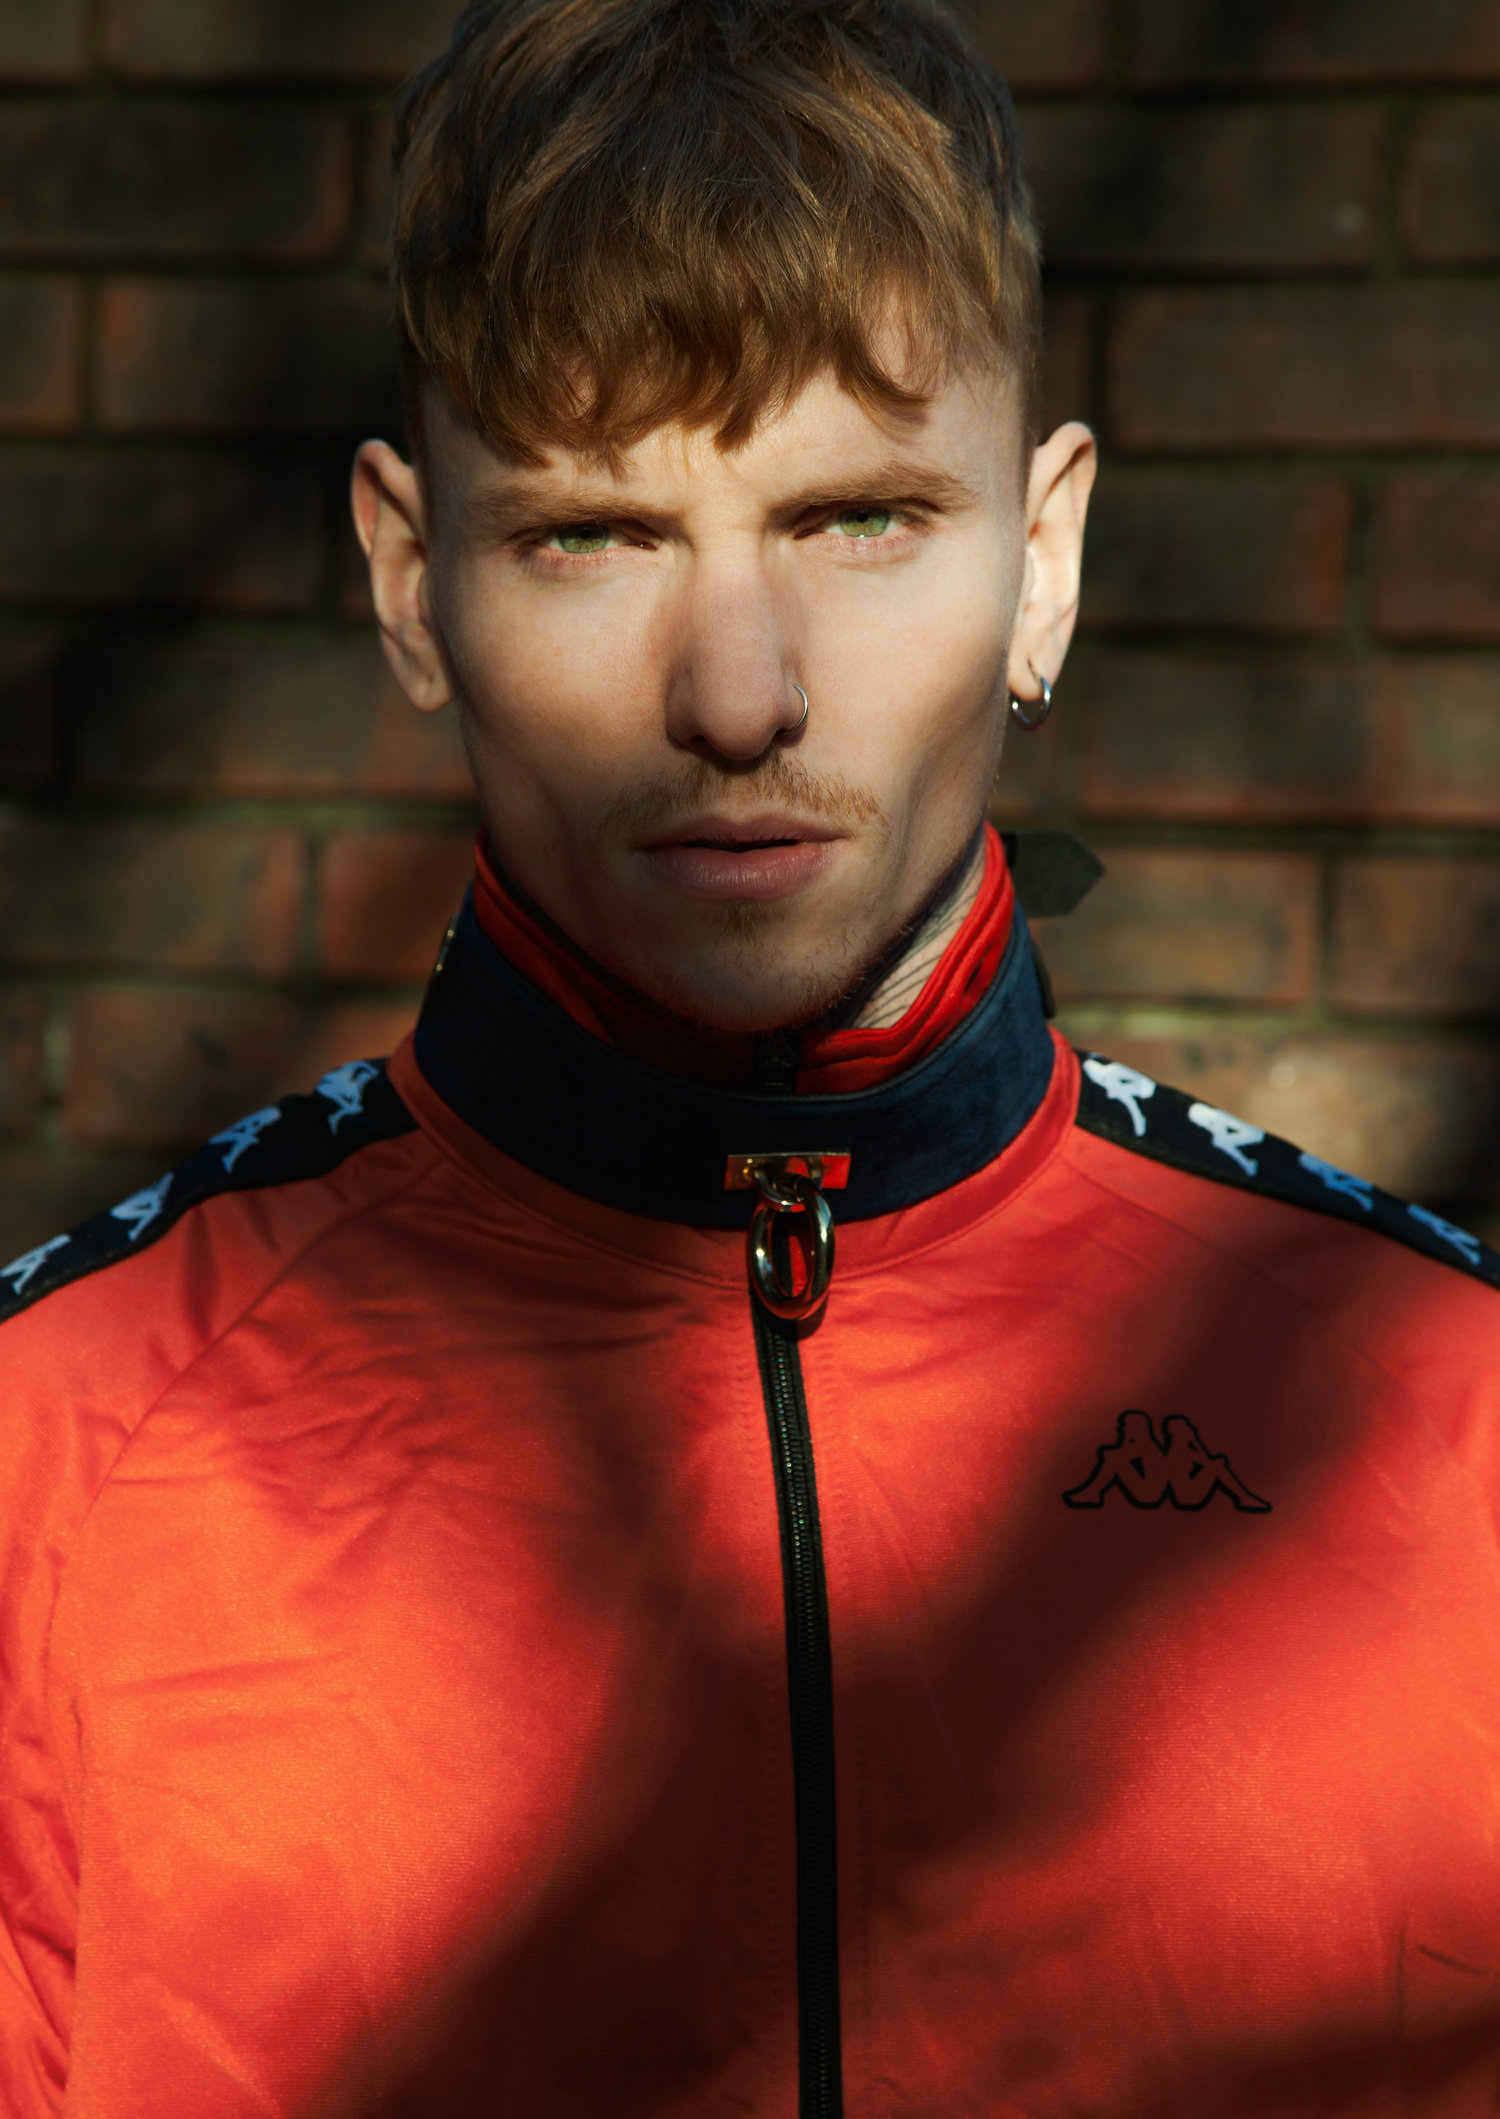 Adon Exclusive: Model Jake Hold By Katja Kat